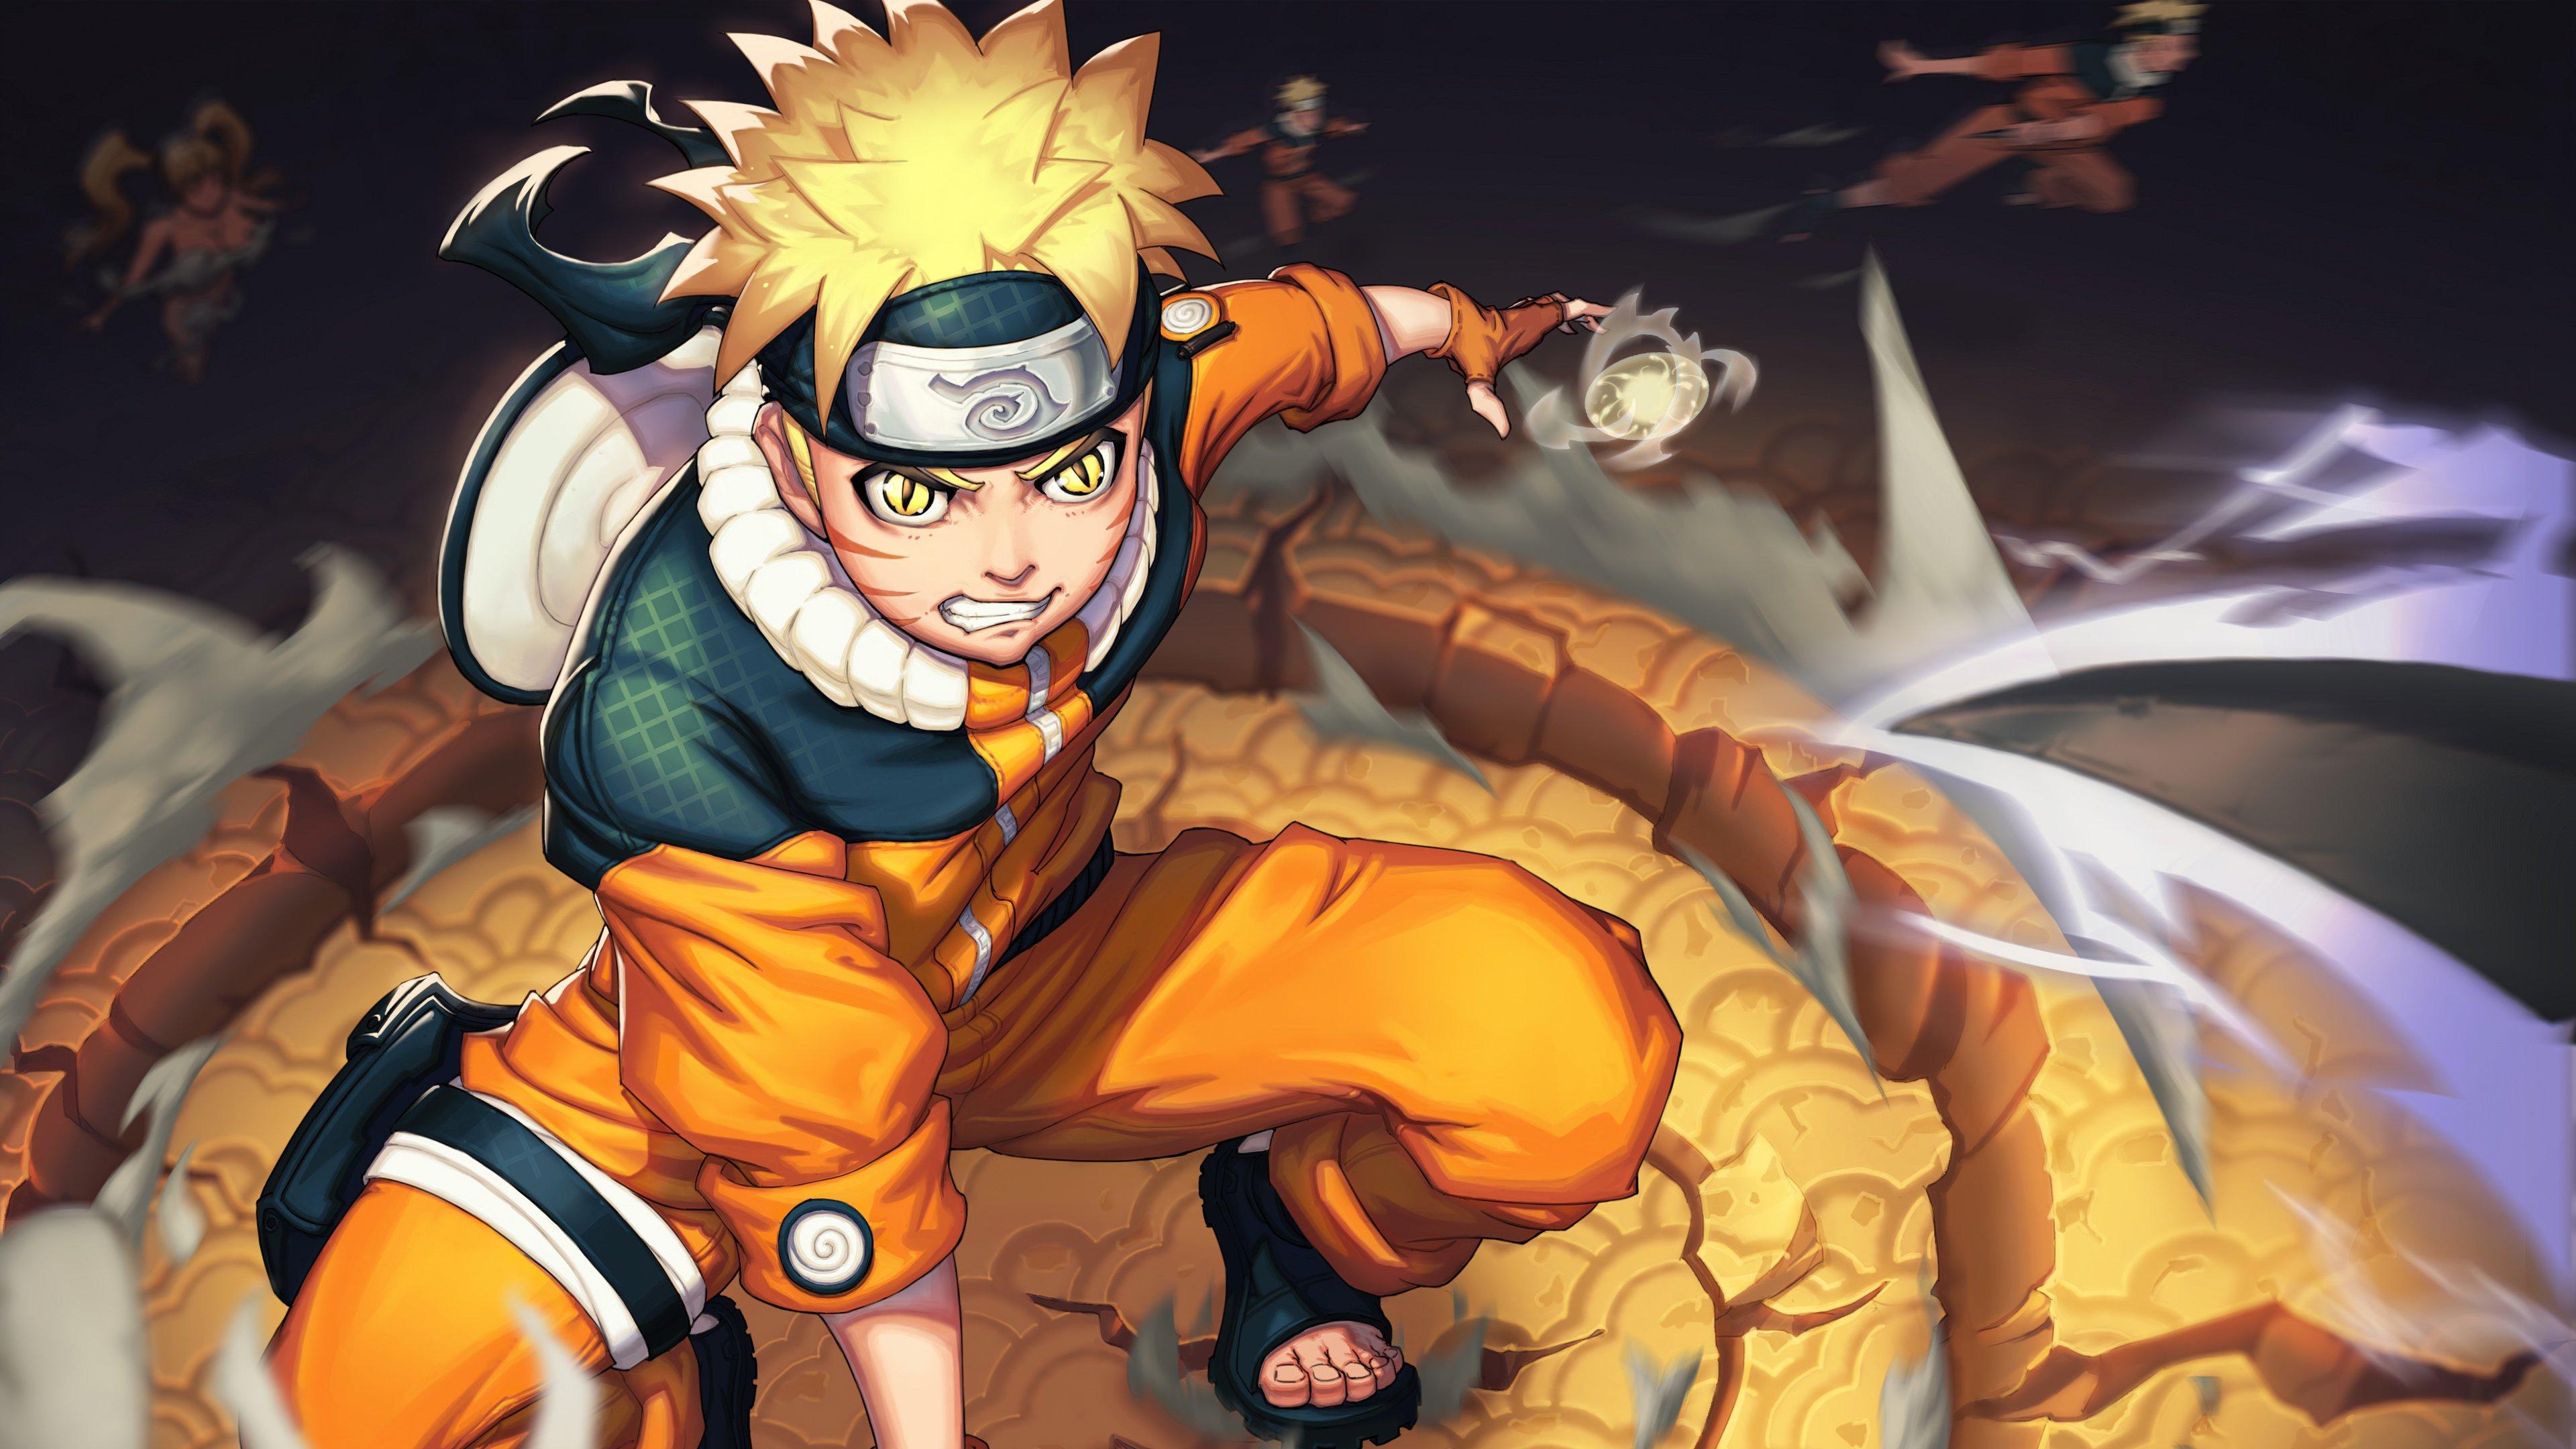 Naruto Fanart Anime Wallpaper 4k Ultra HD ID:4911